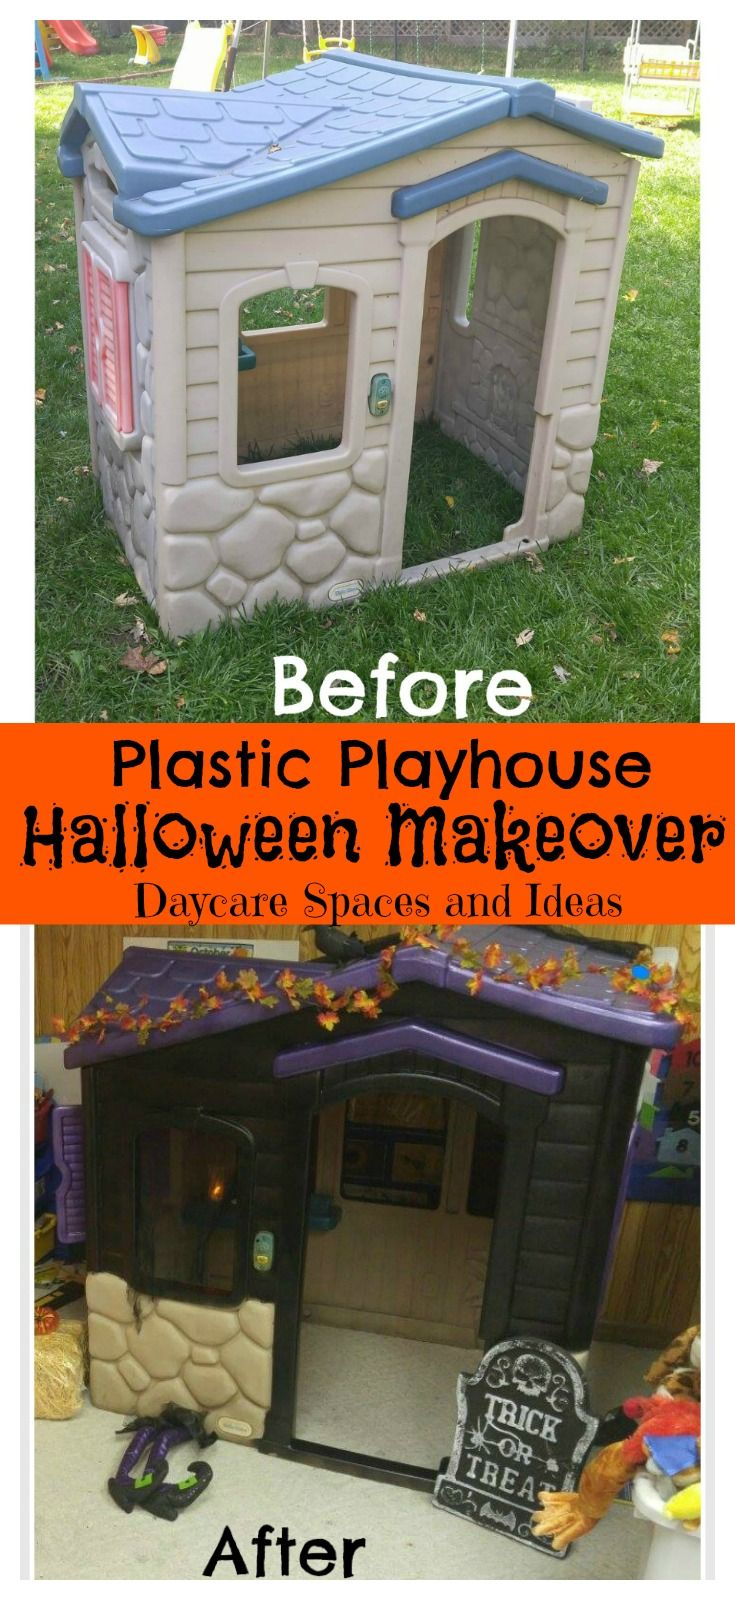 Plastic Playhouse Halloween Makeover Fun Halloween Decor Haunted House For Kids Halloween Haunted Houses Haunted house ideas for backyard